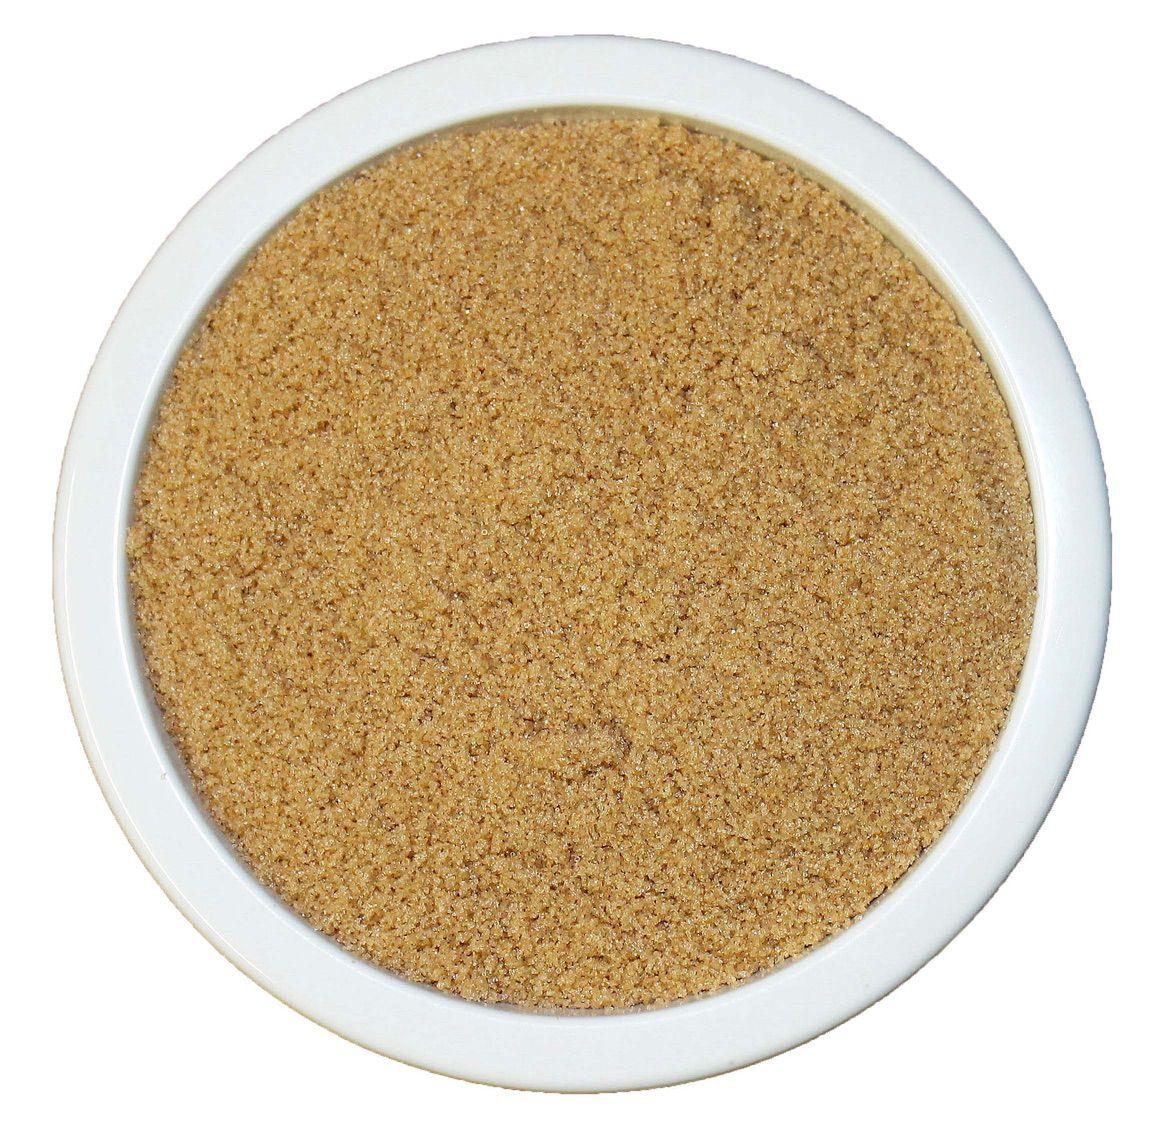 Rauchsalz Hickory 100 g Vegetarier Veganer 1A Qualität Edles Salz PEnandiTRA ®